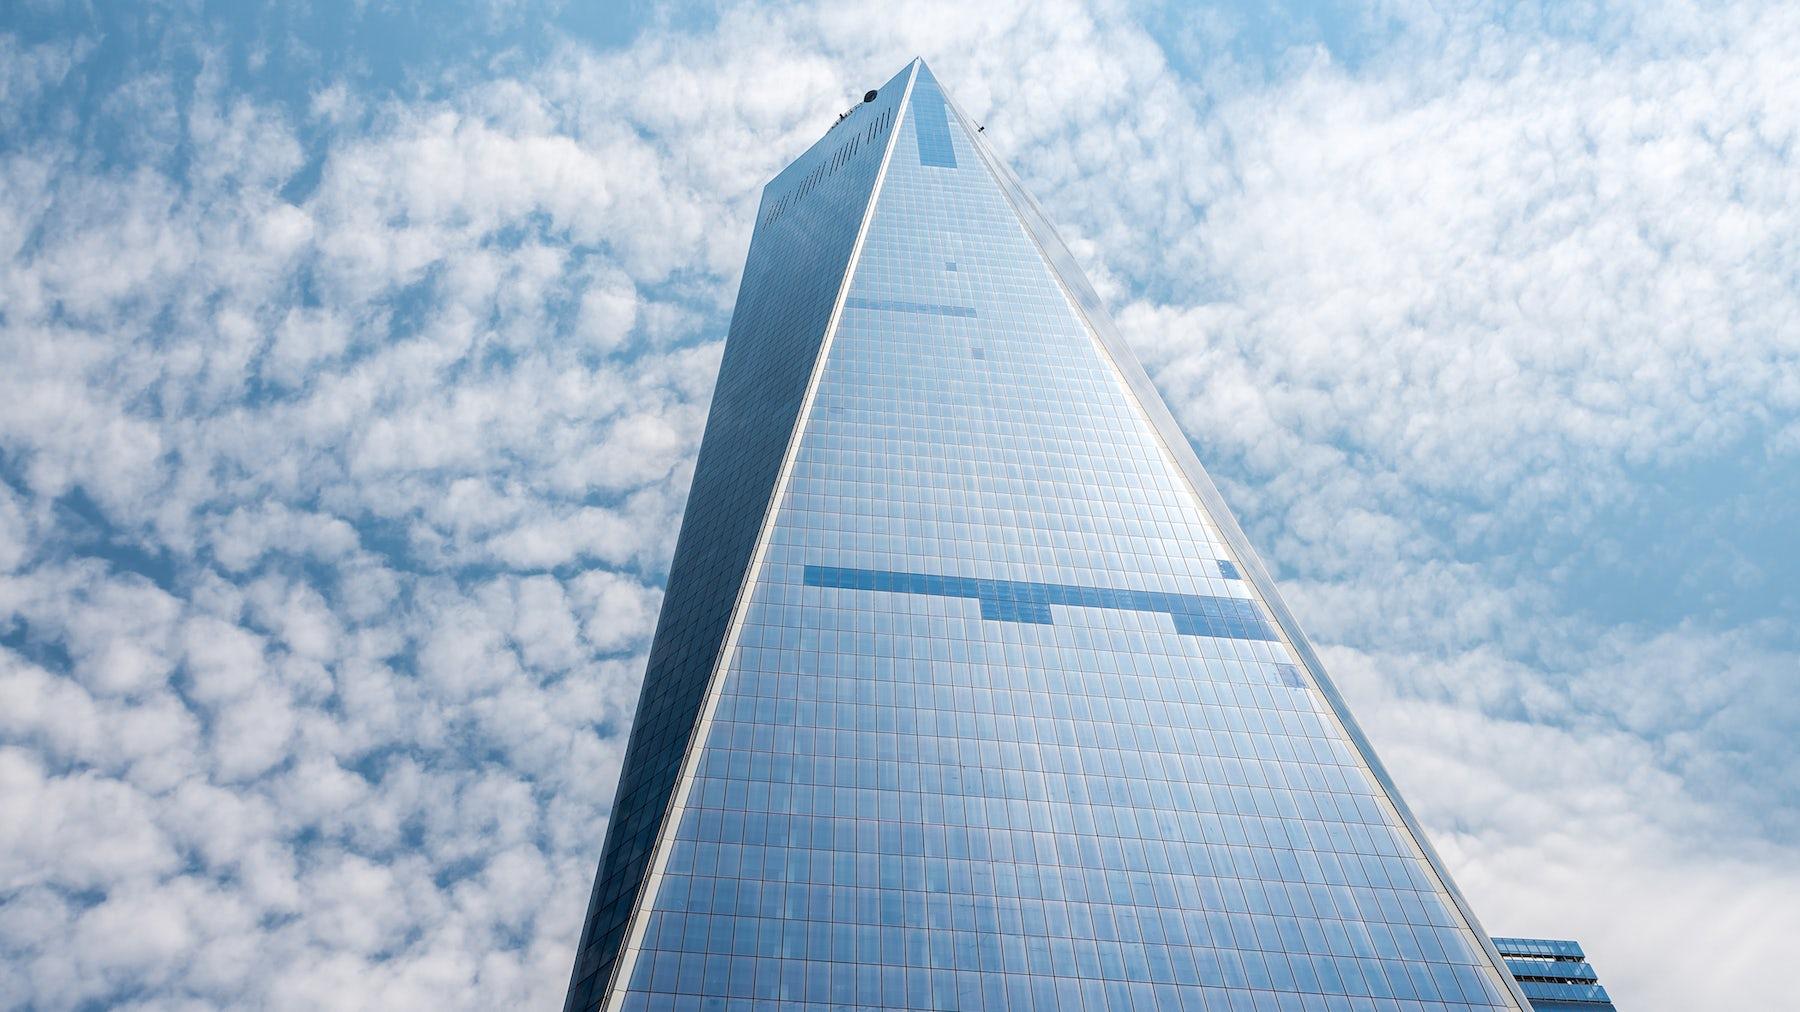 Condé Nast headquarters, New York   Source: Shutterstock